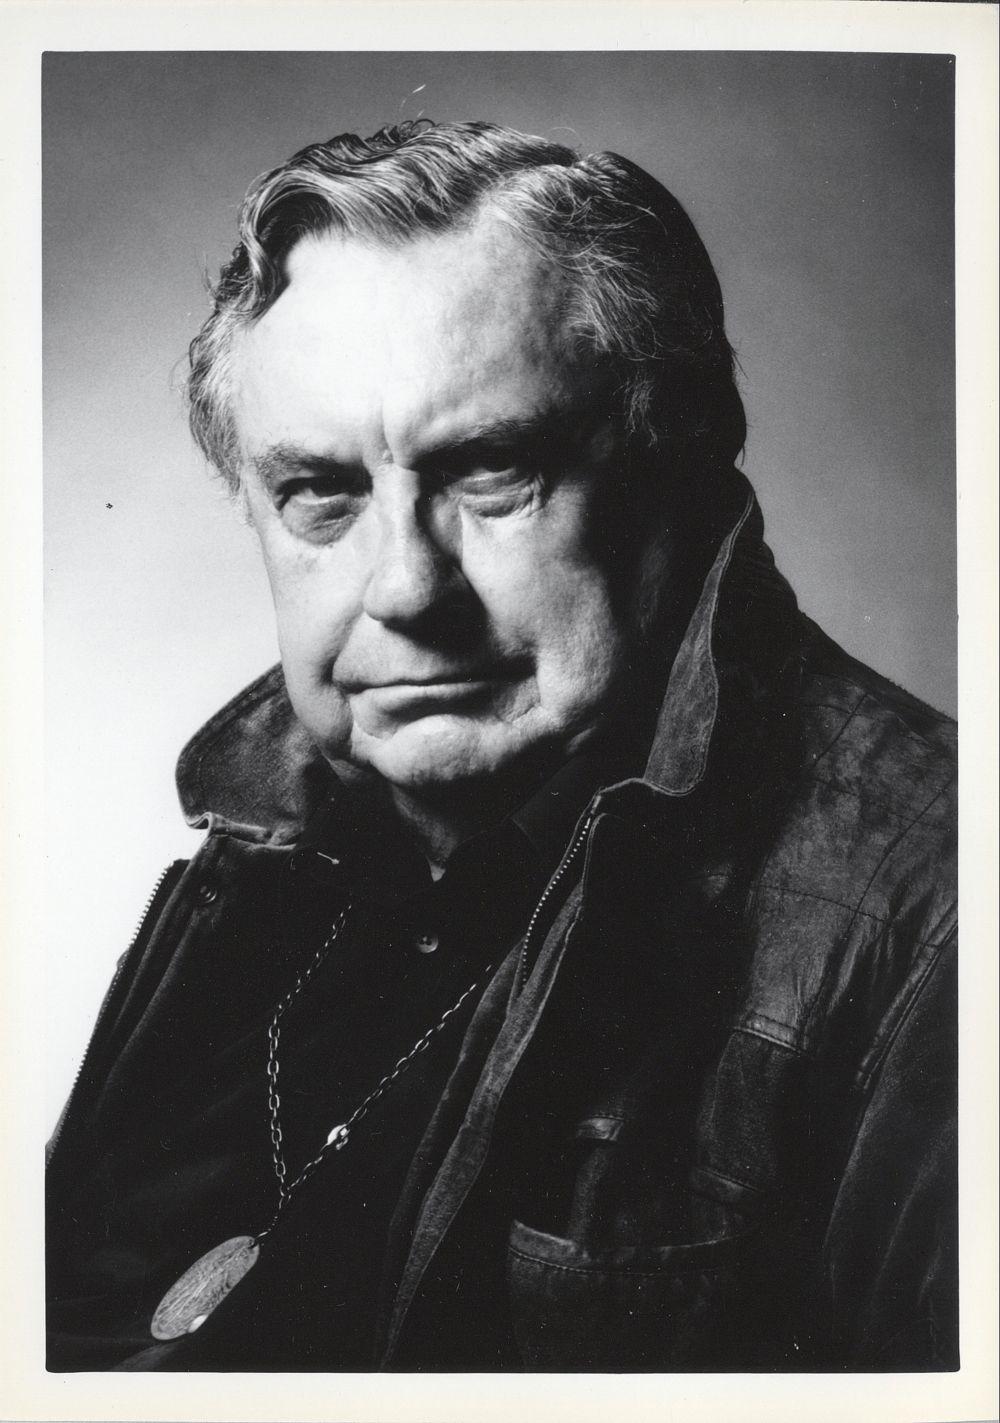 Harry Lawton